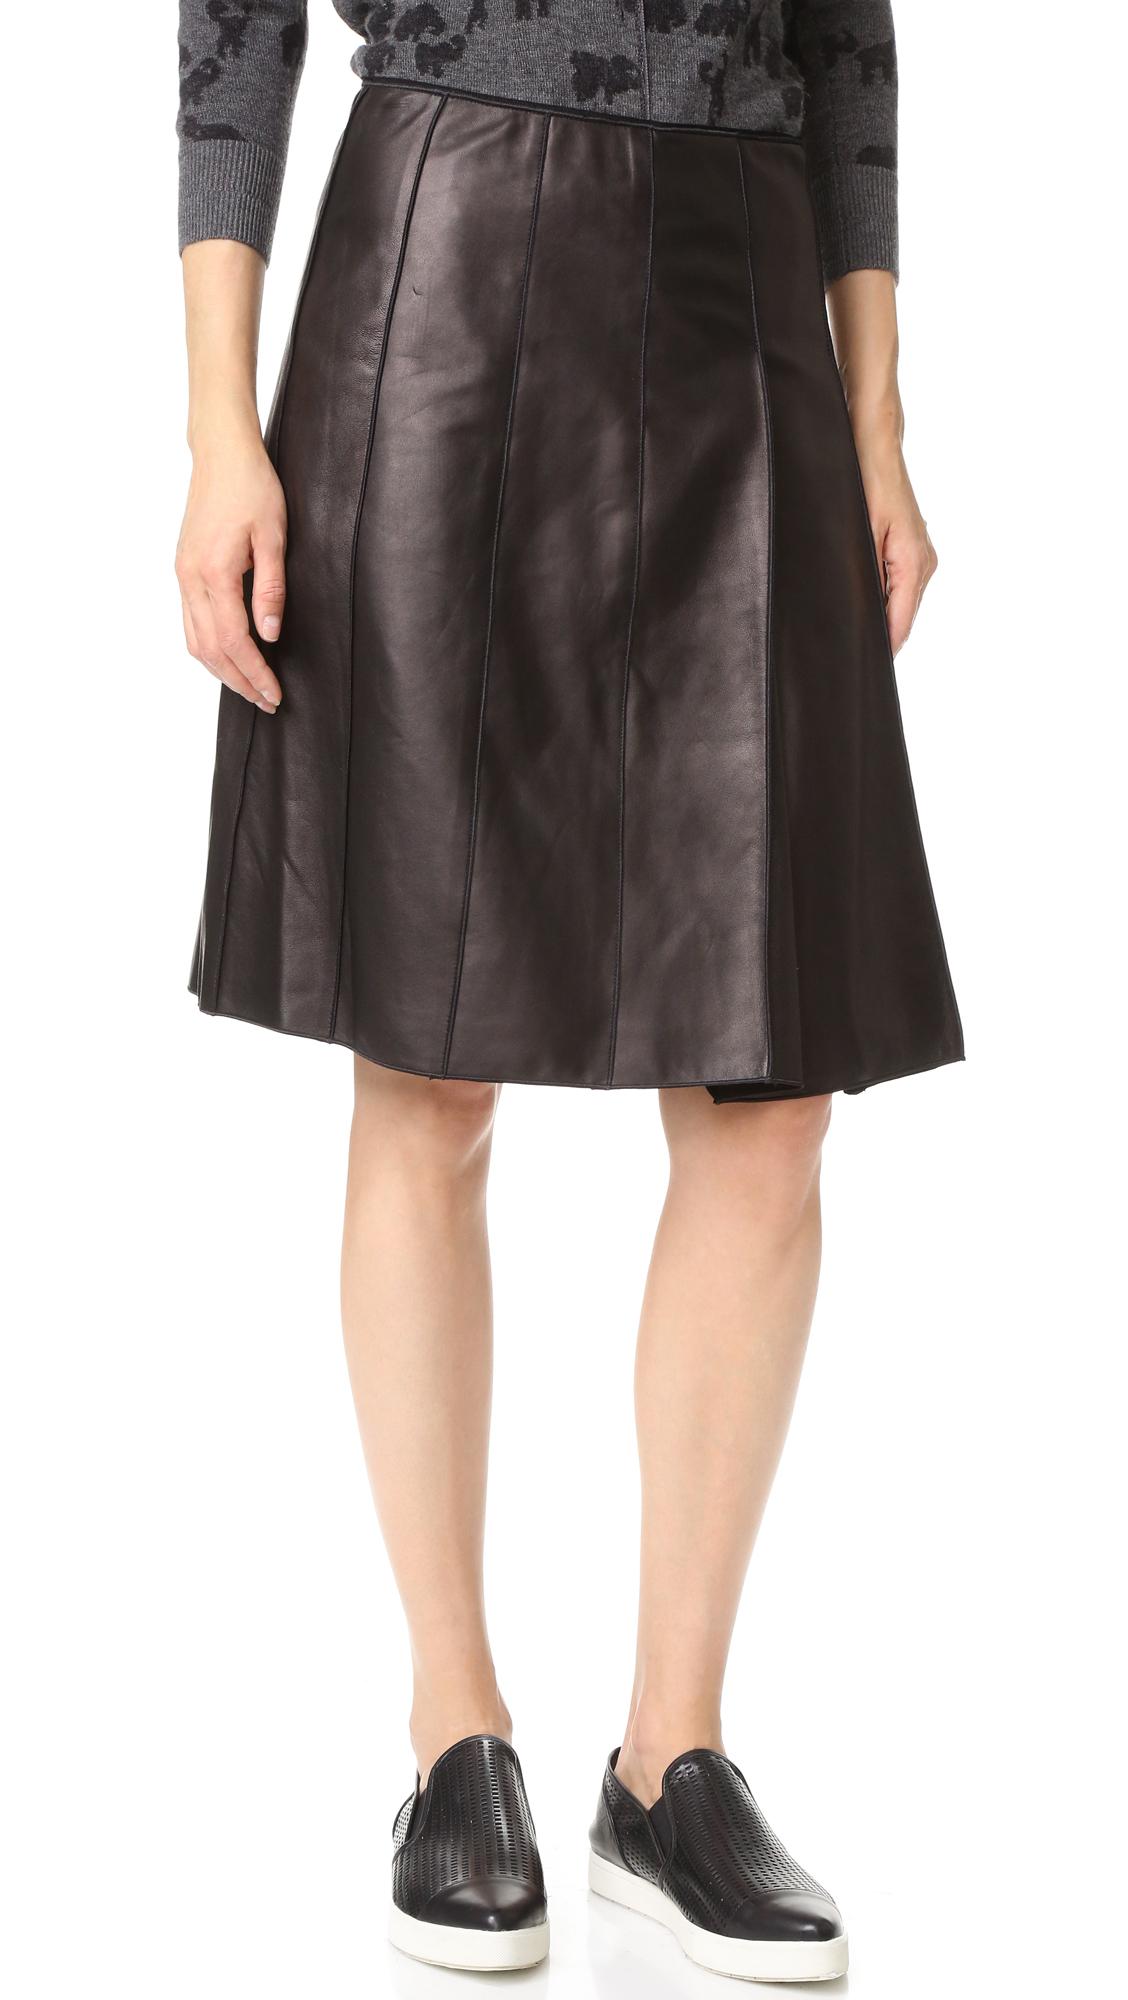 marc lambskin pleated leather skirt in lyst